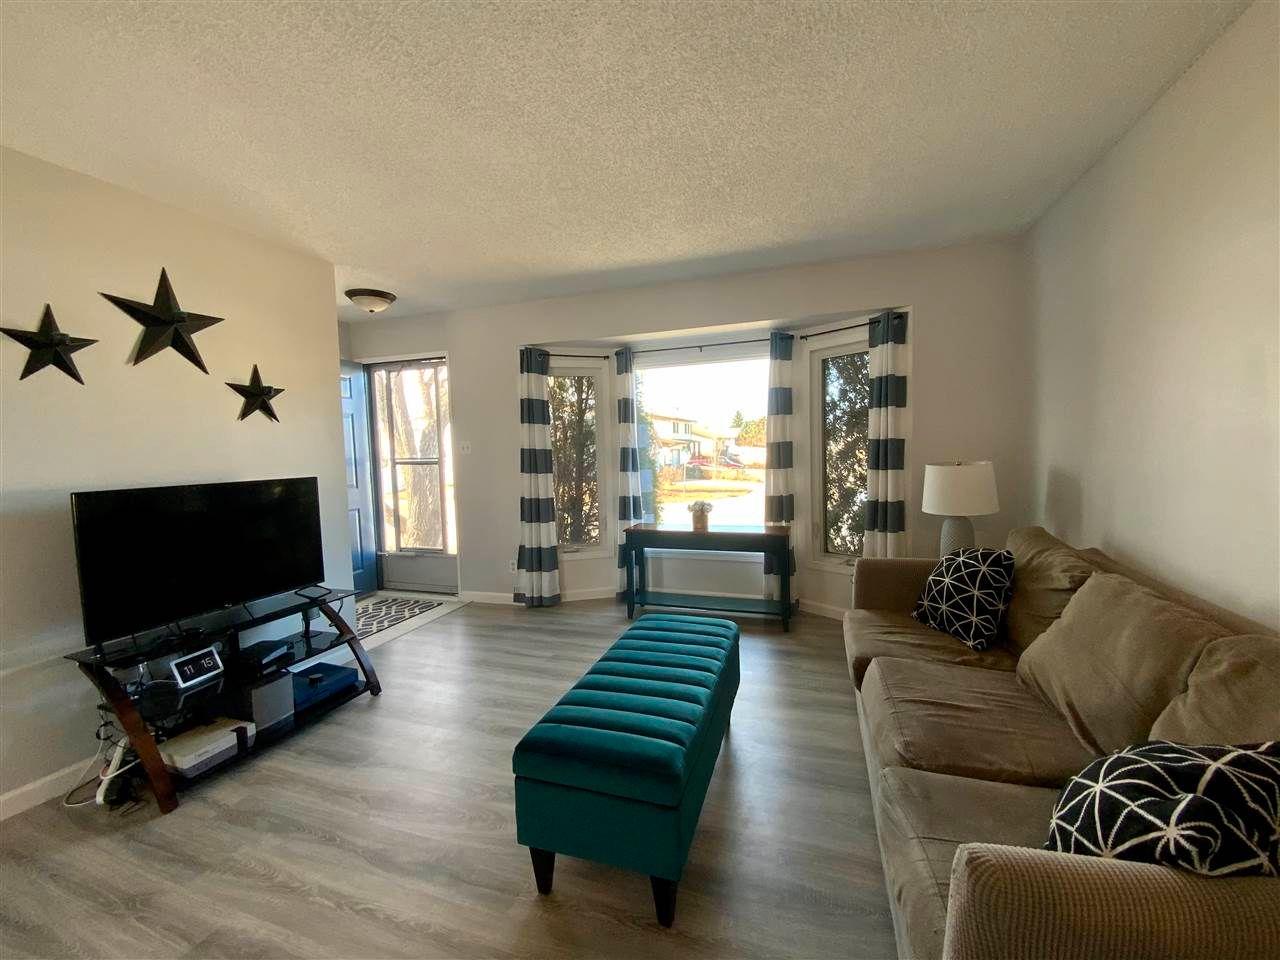 Main Photo: 129 Garwood Drive: Wetaskiwin House for sale : MLS®# E4237649